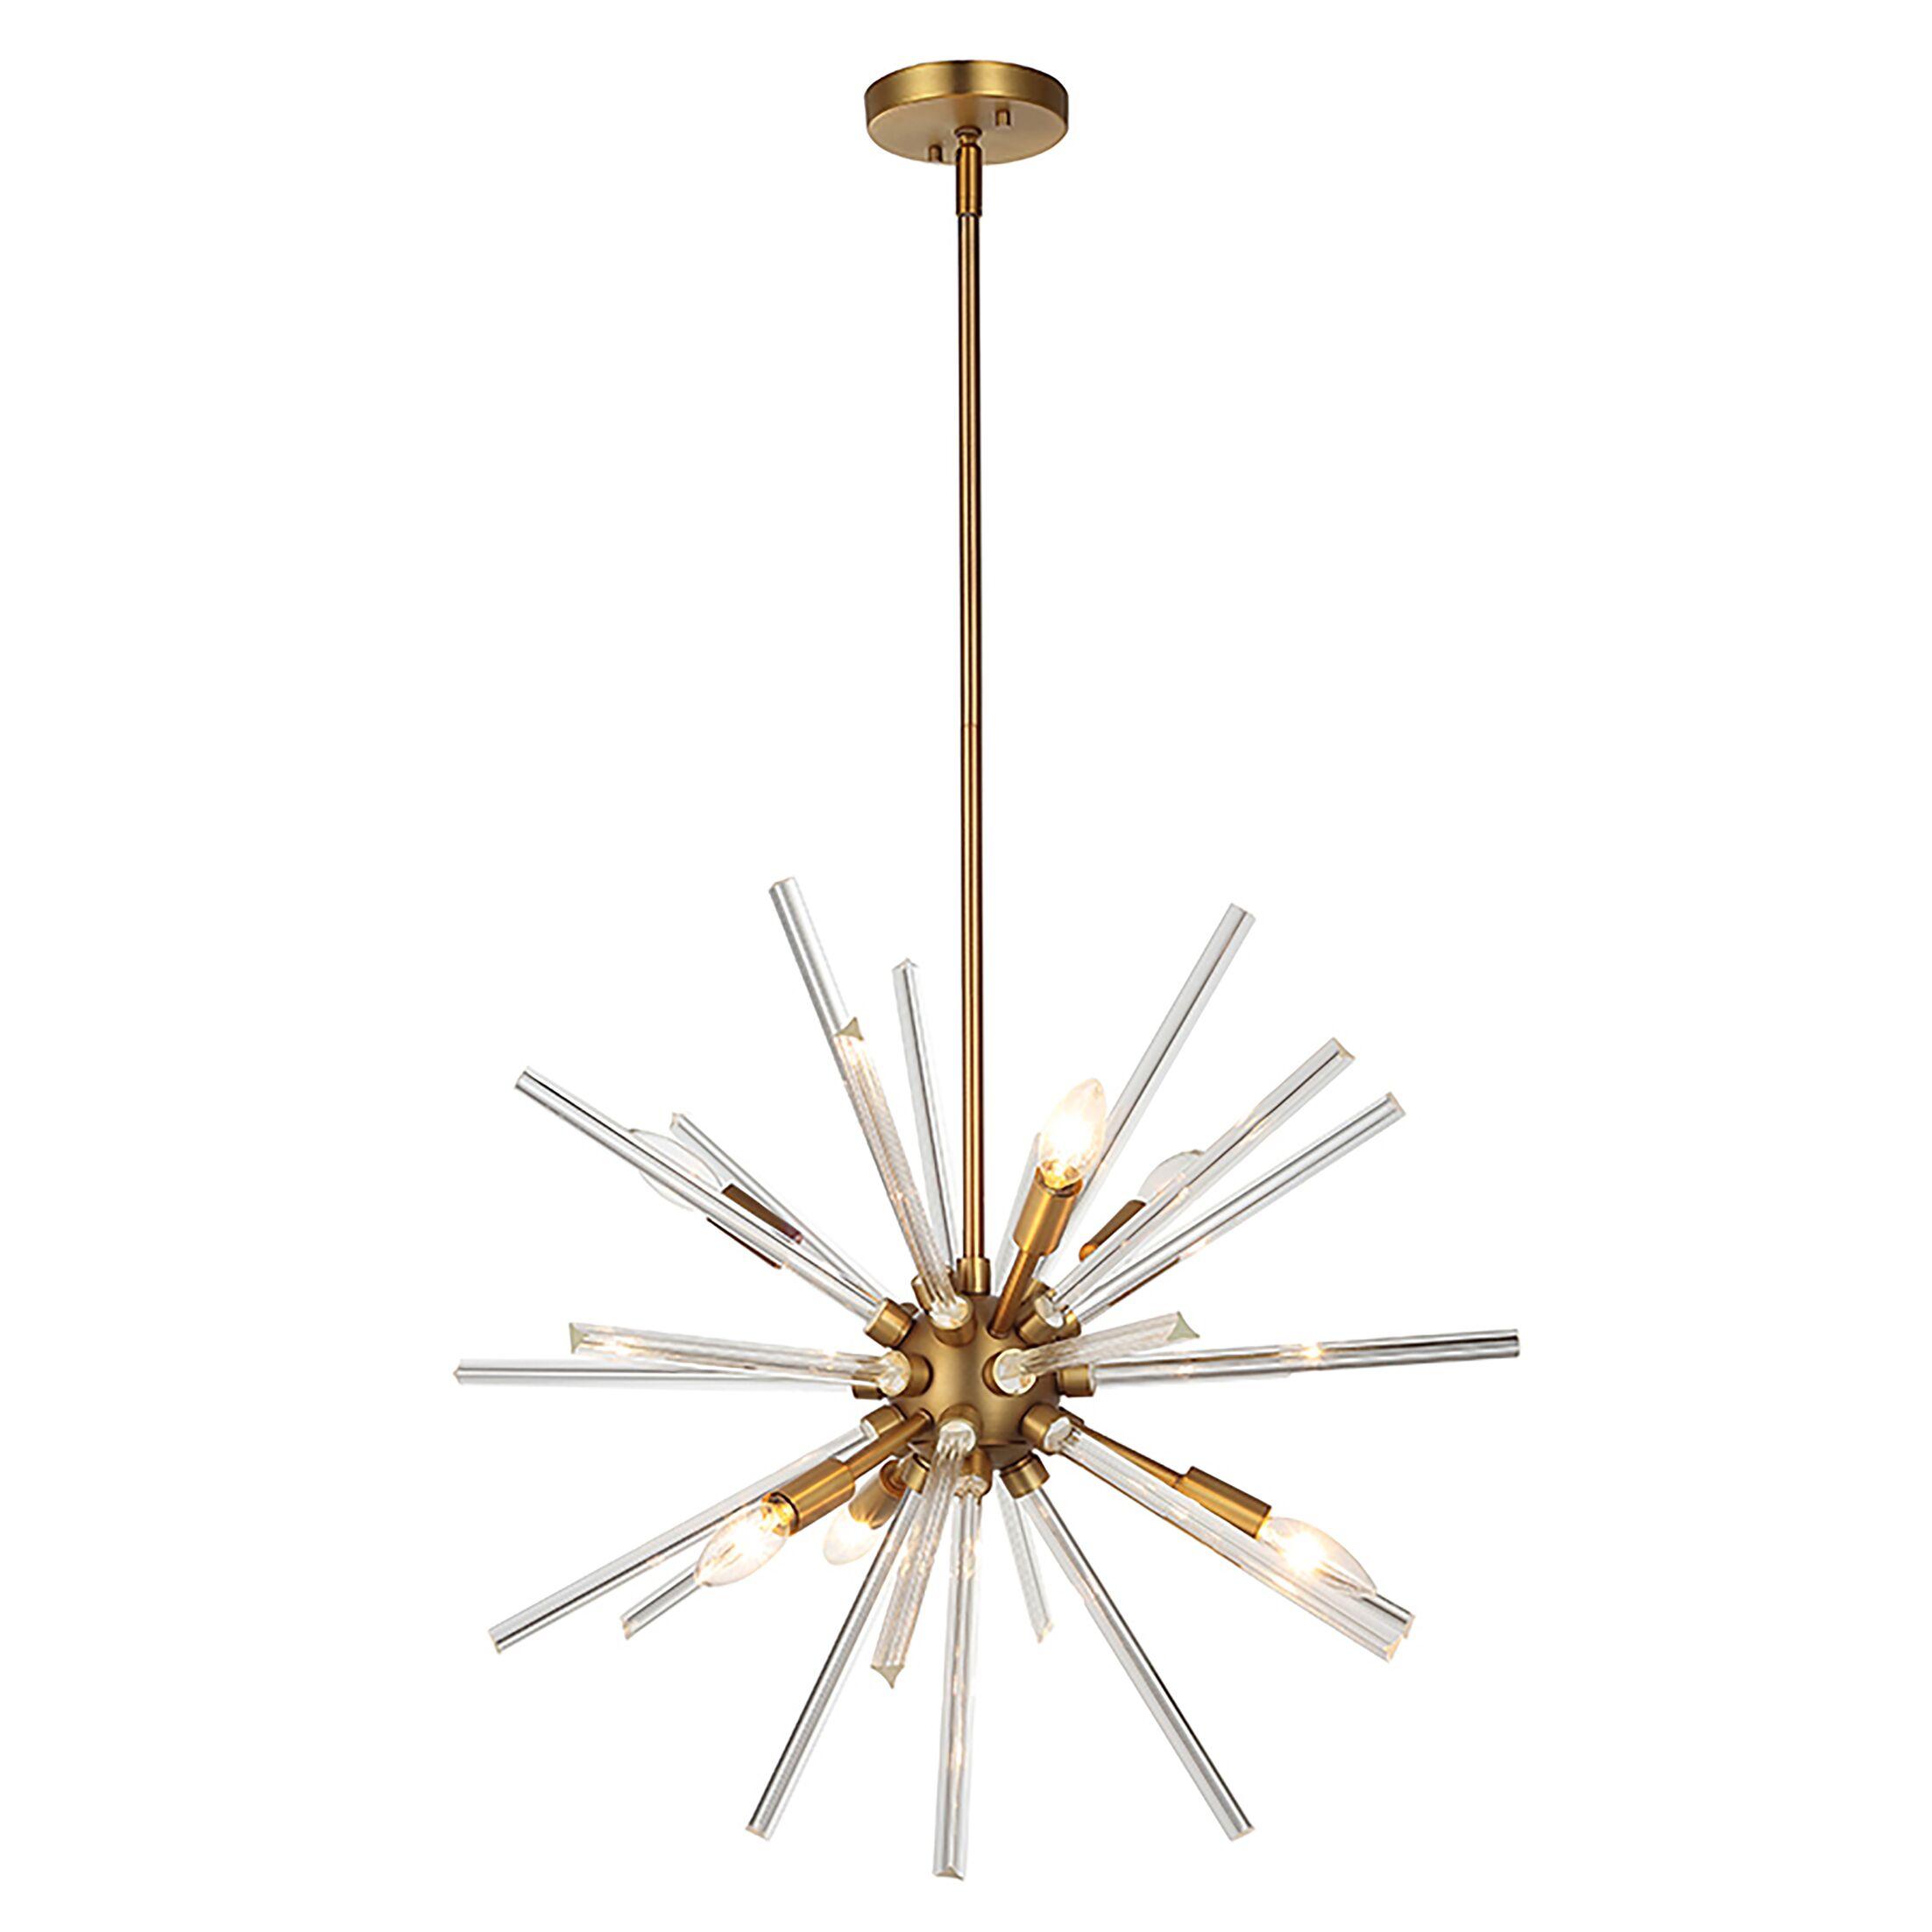 Islais 6-Light Sputnik Chandelier